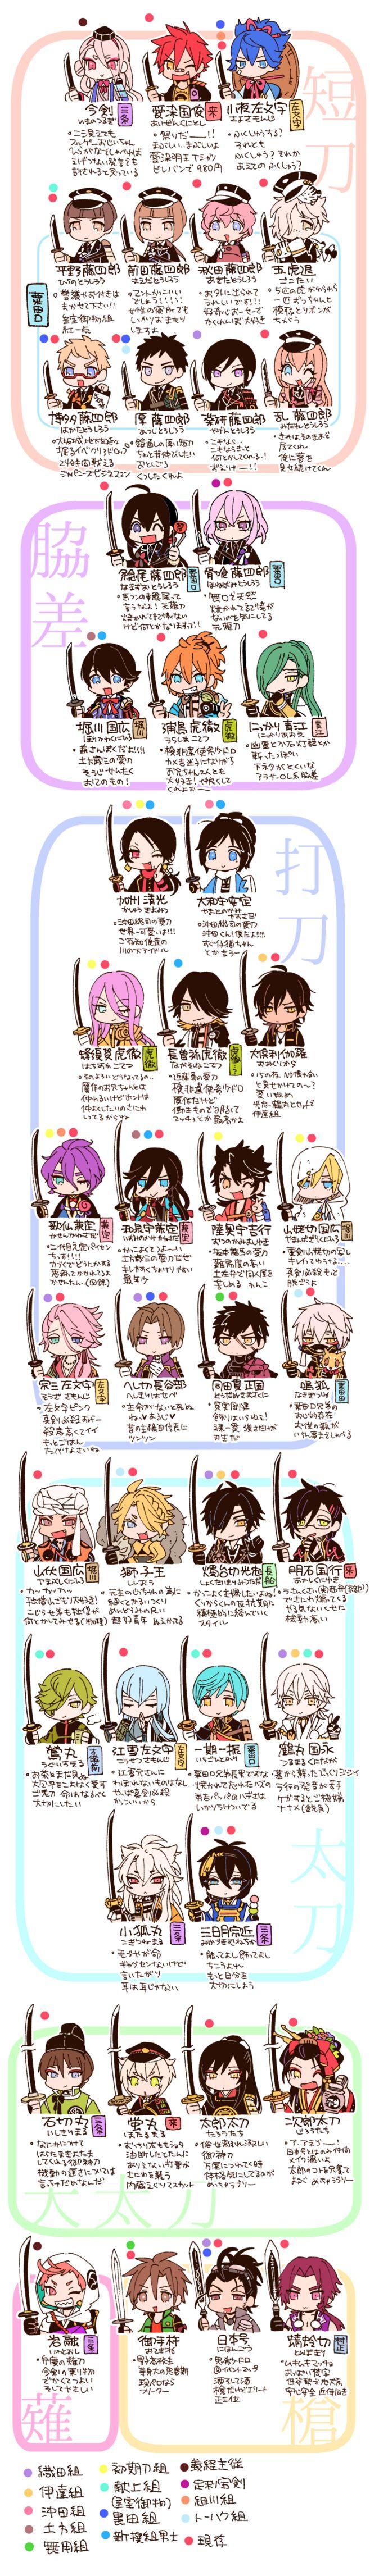 http://www.pixiv.net/member_illust.php?mode=manga_big&illust_id=53491631&page=25